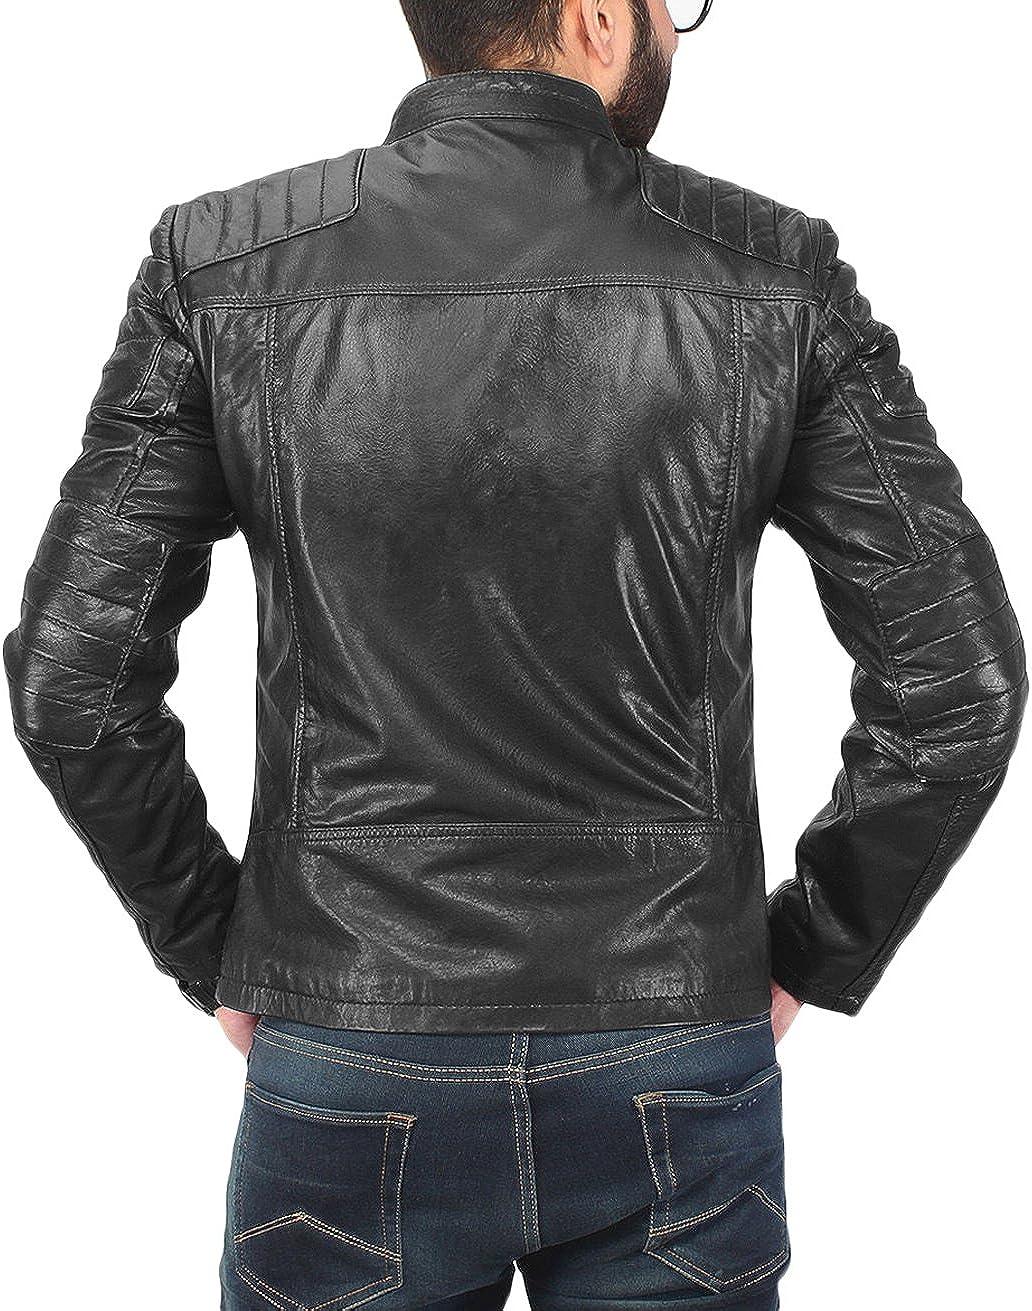 New Men Motorcycle Lambskin Leather Jacket Coat Size XS S M L XL LFM1526